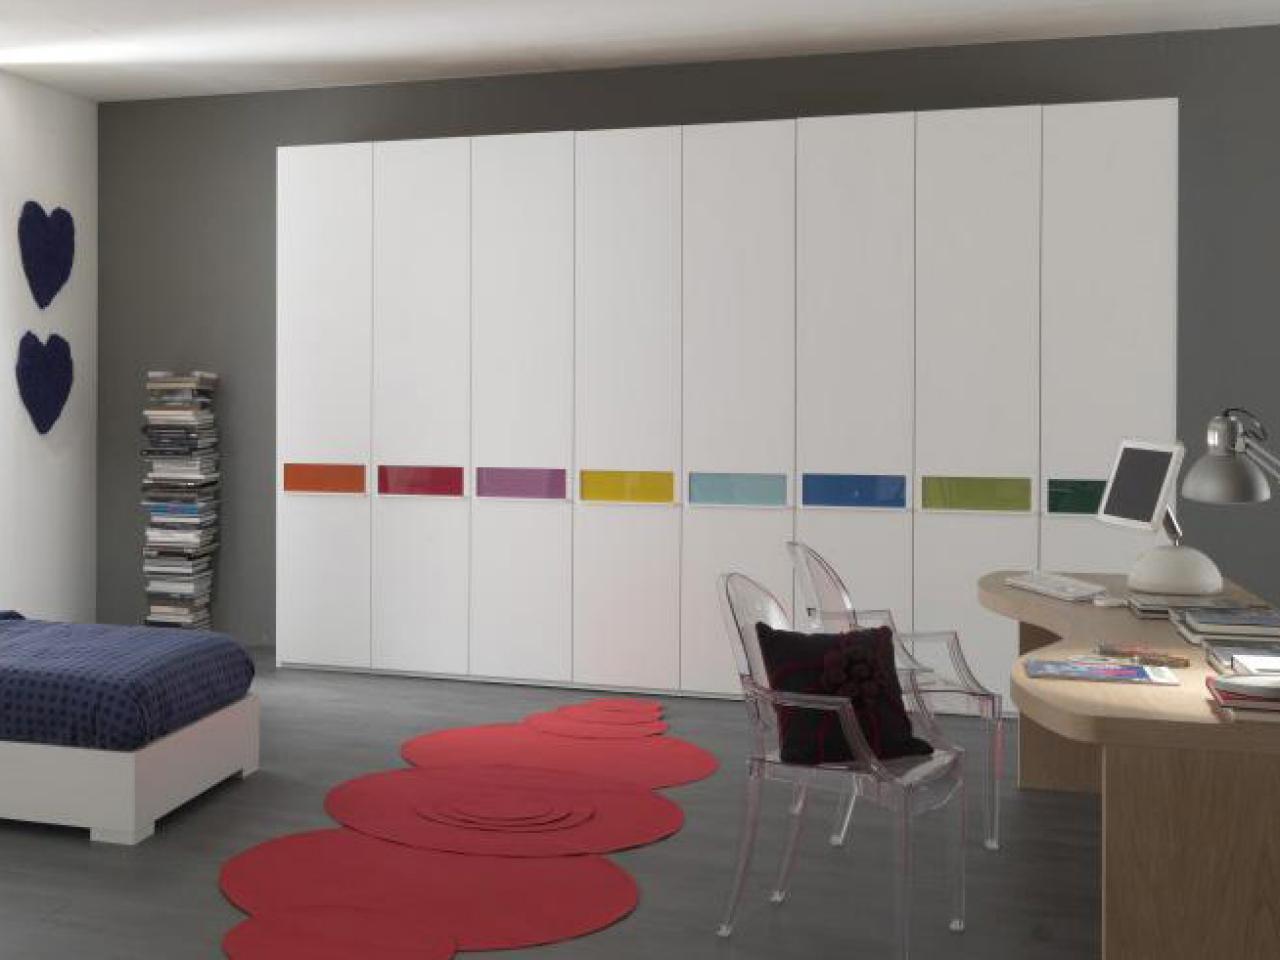 Front Foyer Closet Doors : Sliding closet doors: design ideas and options hgtv